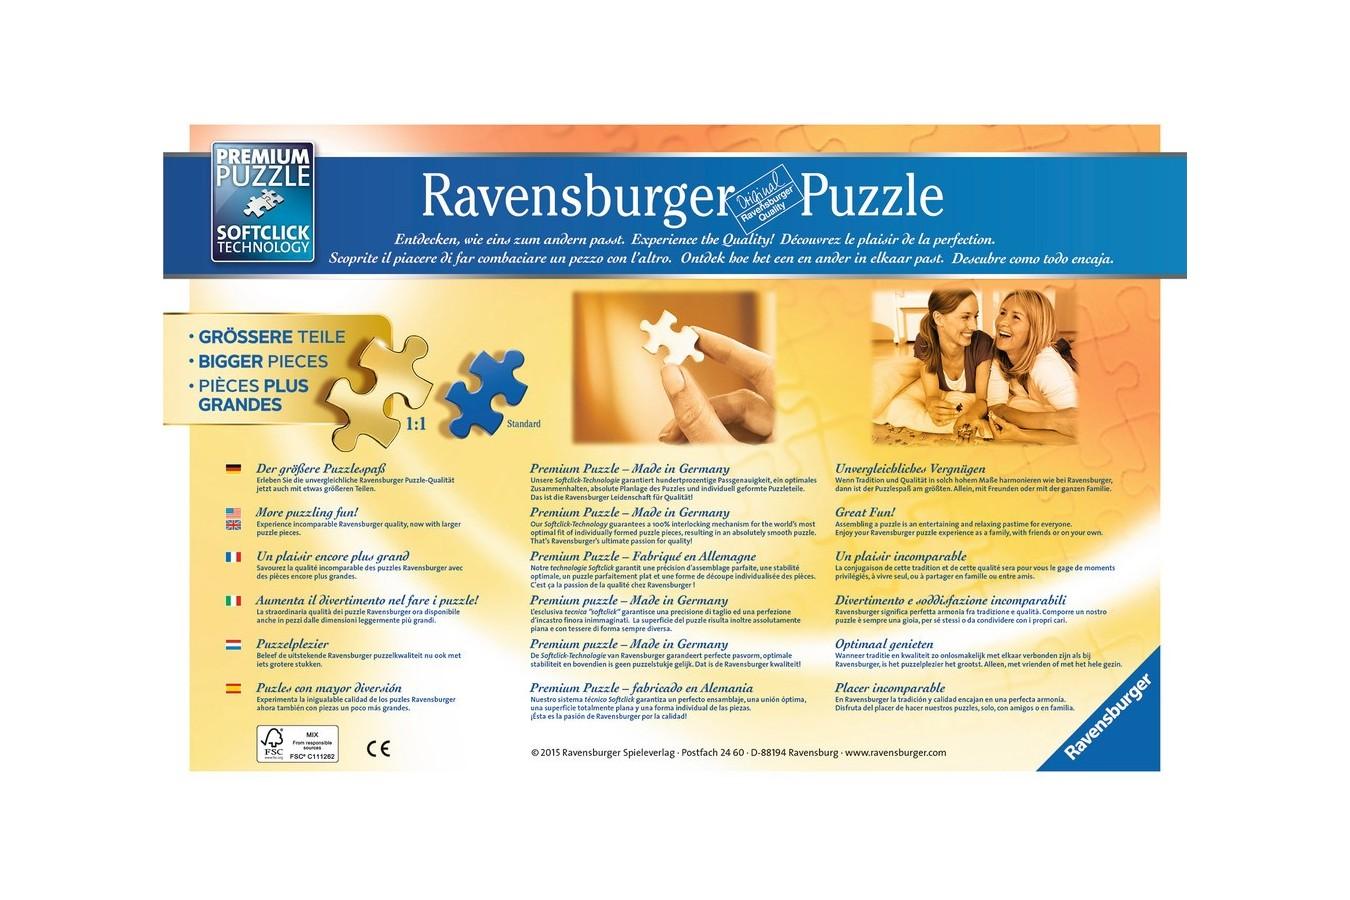 Puzzle Ravensburger - Vapor Pe Insula, 500 piese (13647)